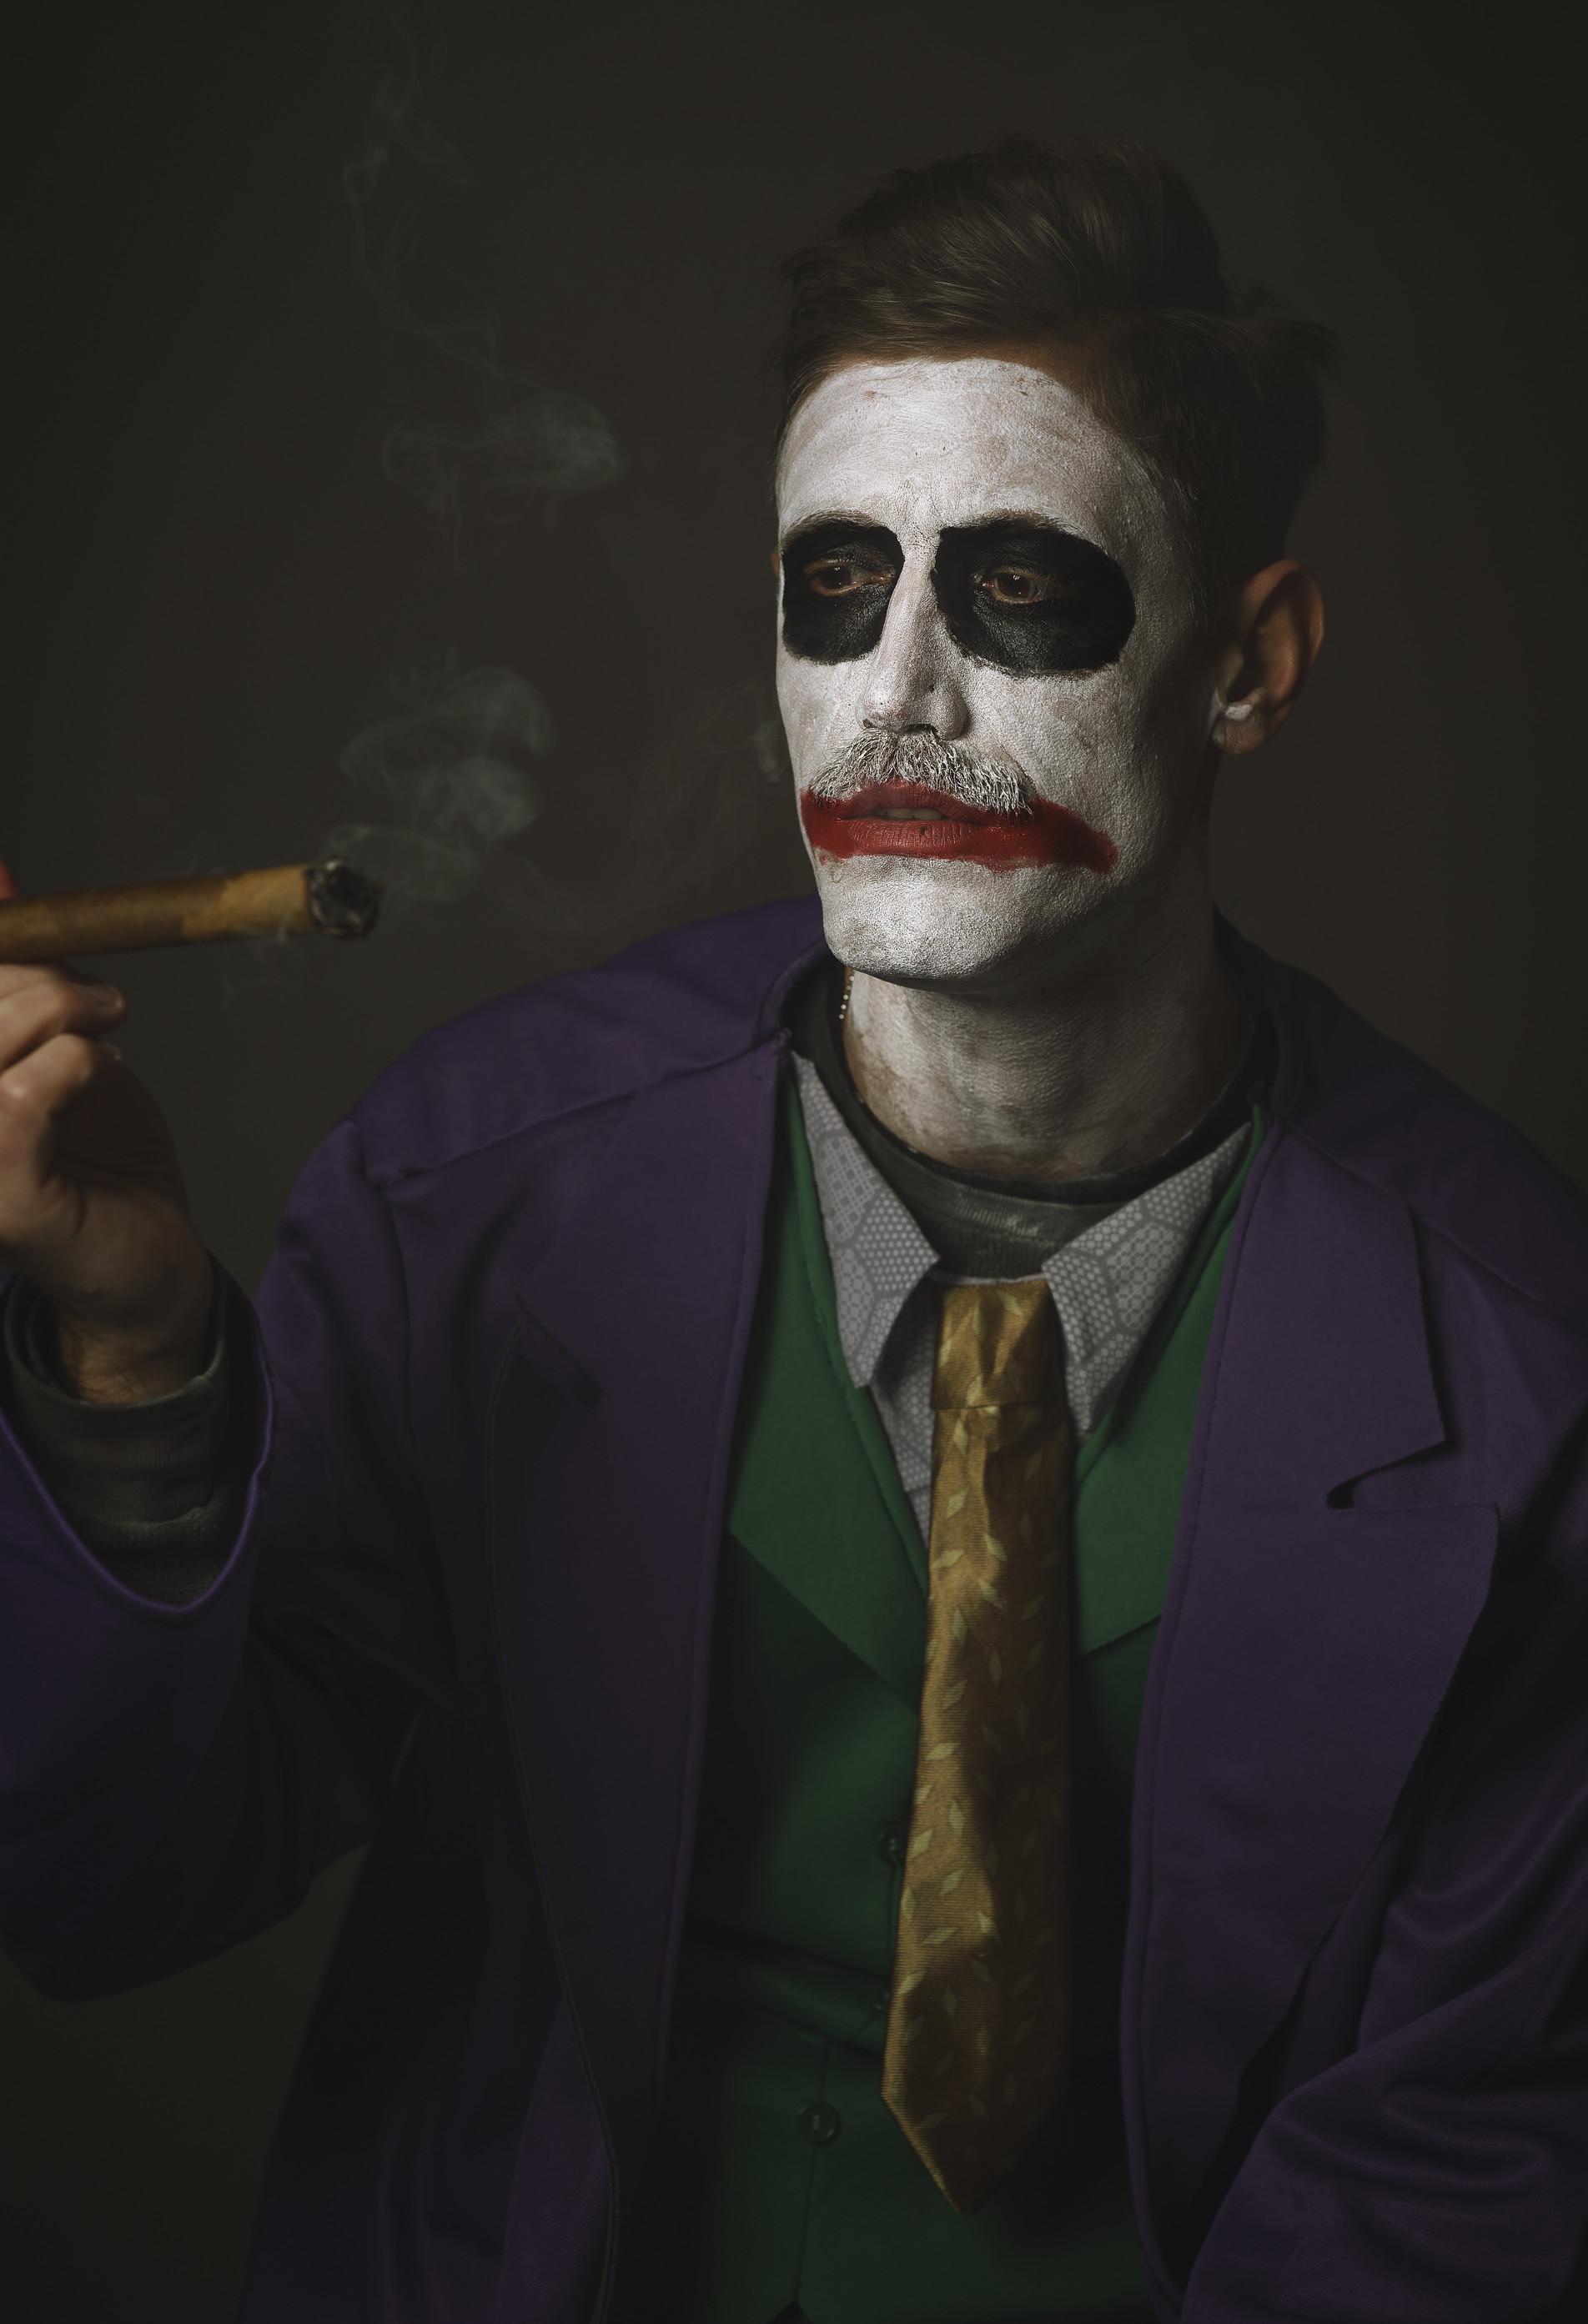 Portrait Photography the Jocker